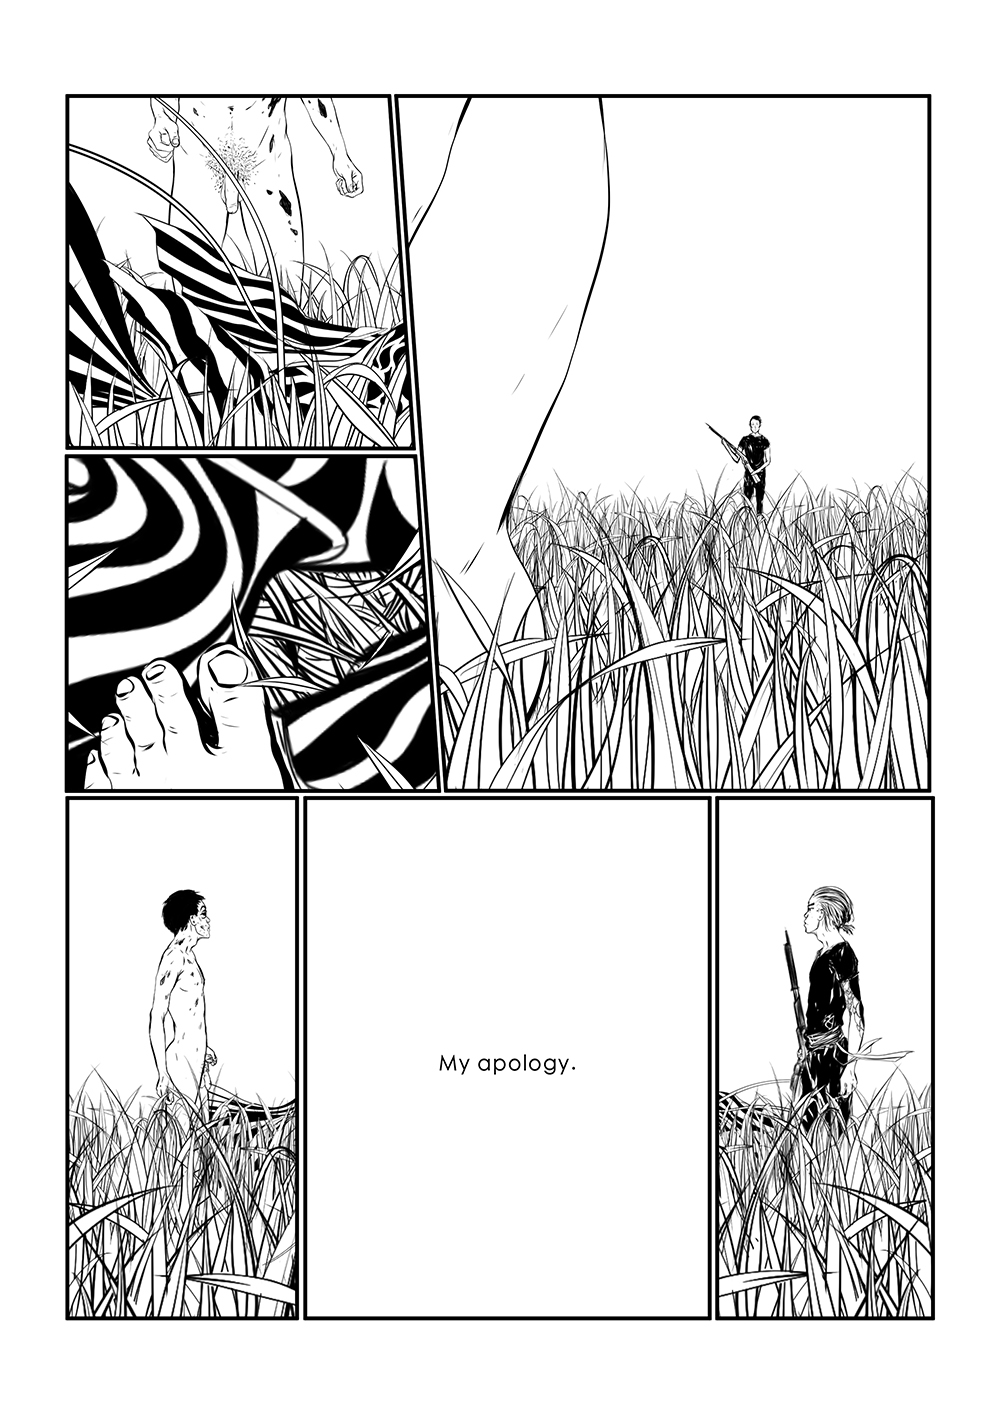 mojowang_illustration_betweenrivers_24_4.jpg